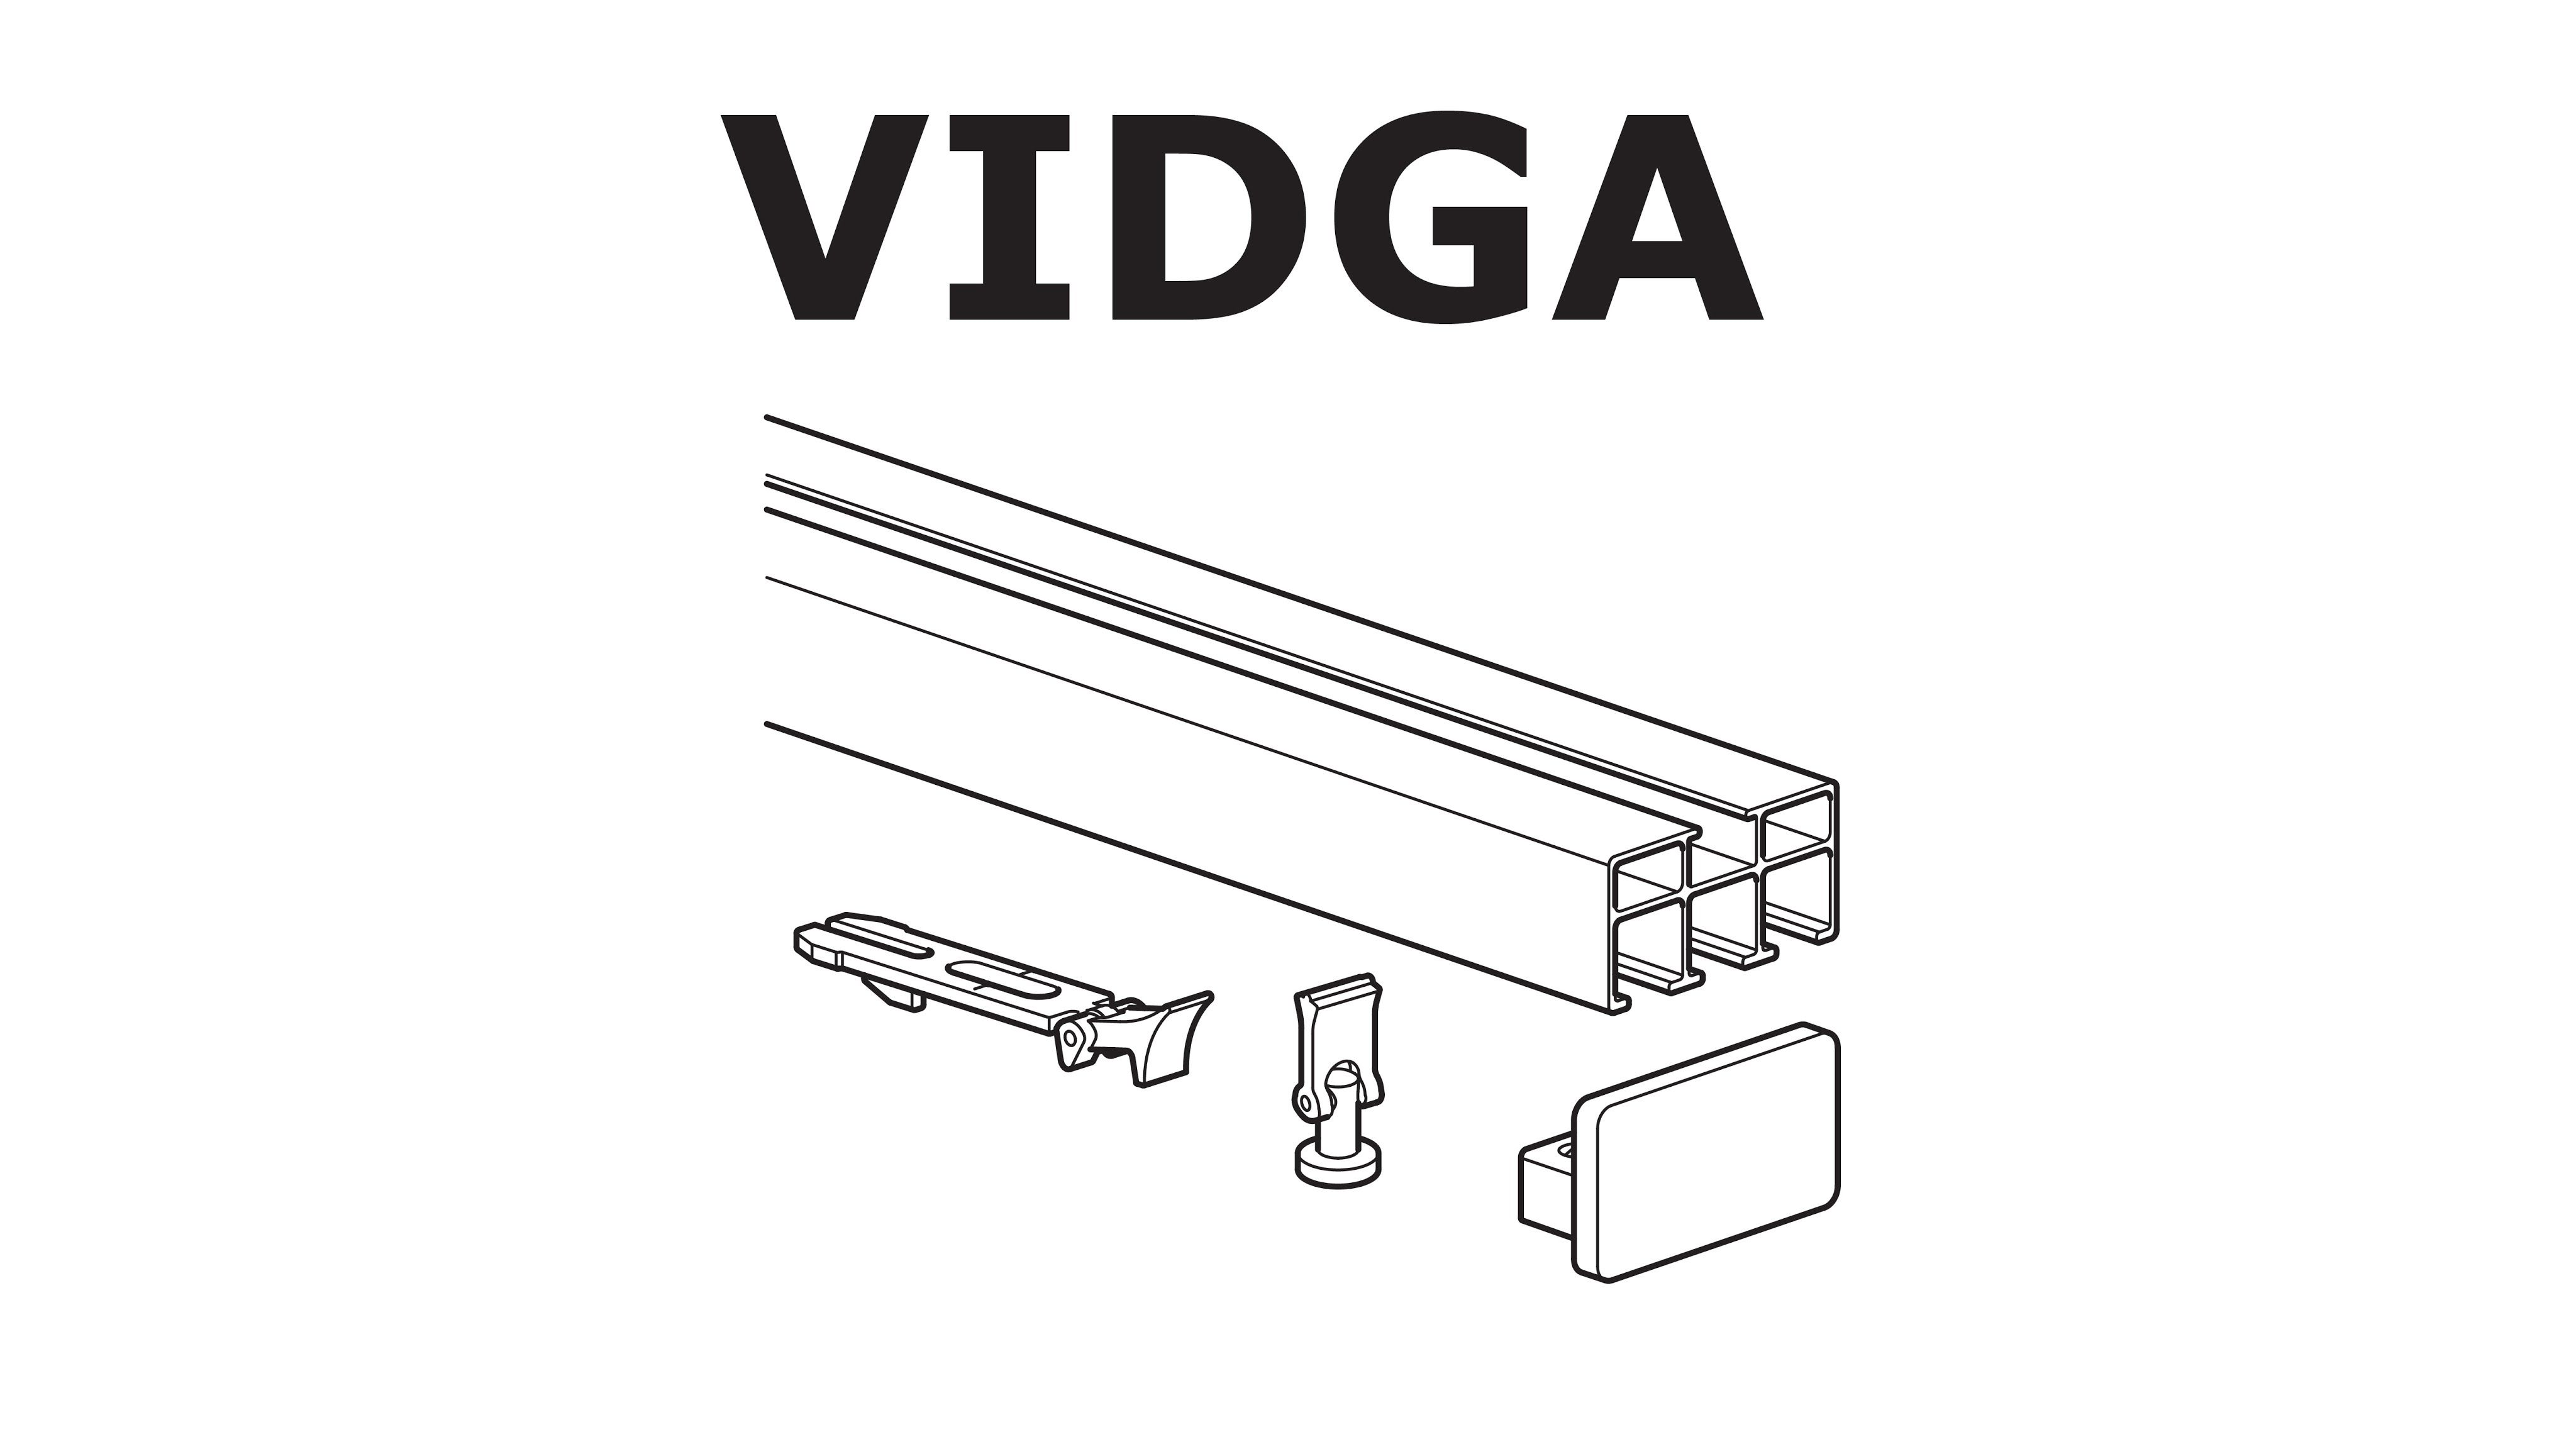 Bad Gordijn Rail.How To Install Ikea Vidga Rail Triple Track My Bathroom In 2019